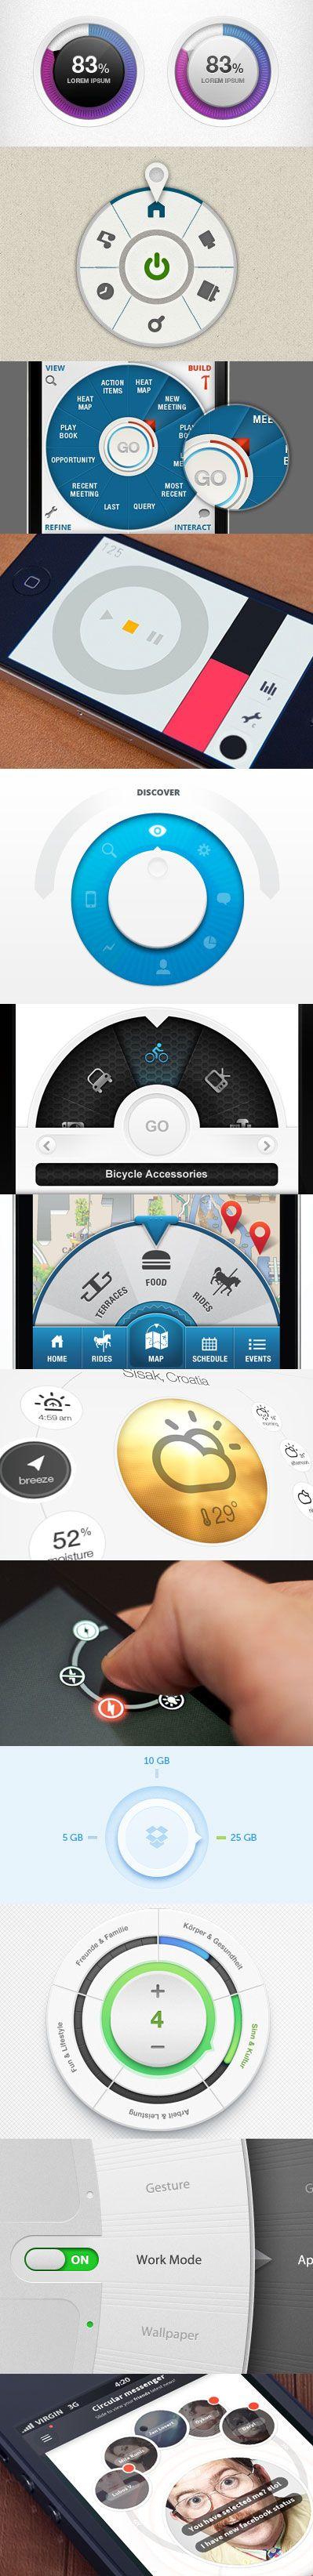 Circular mobile UI elements